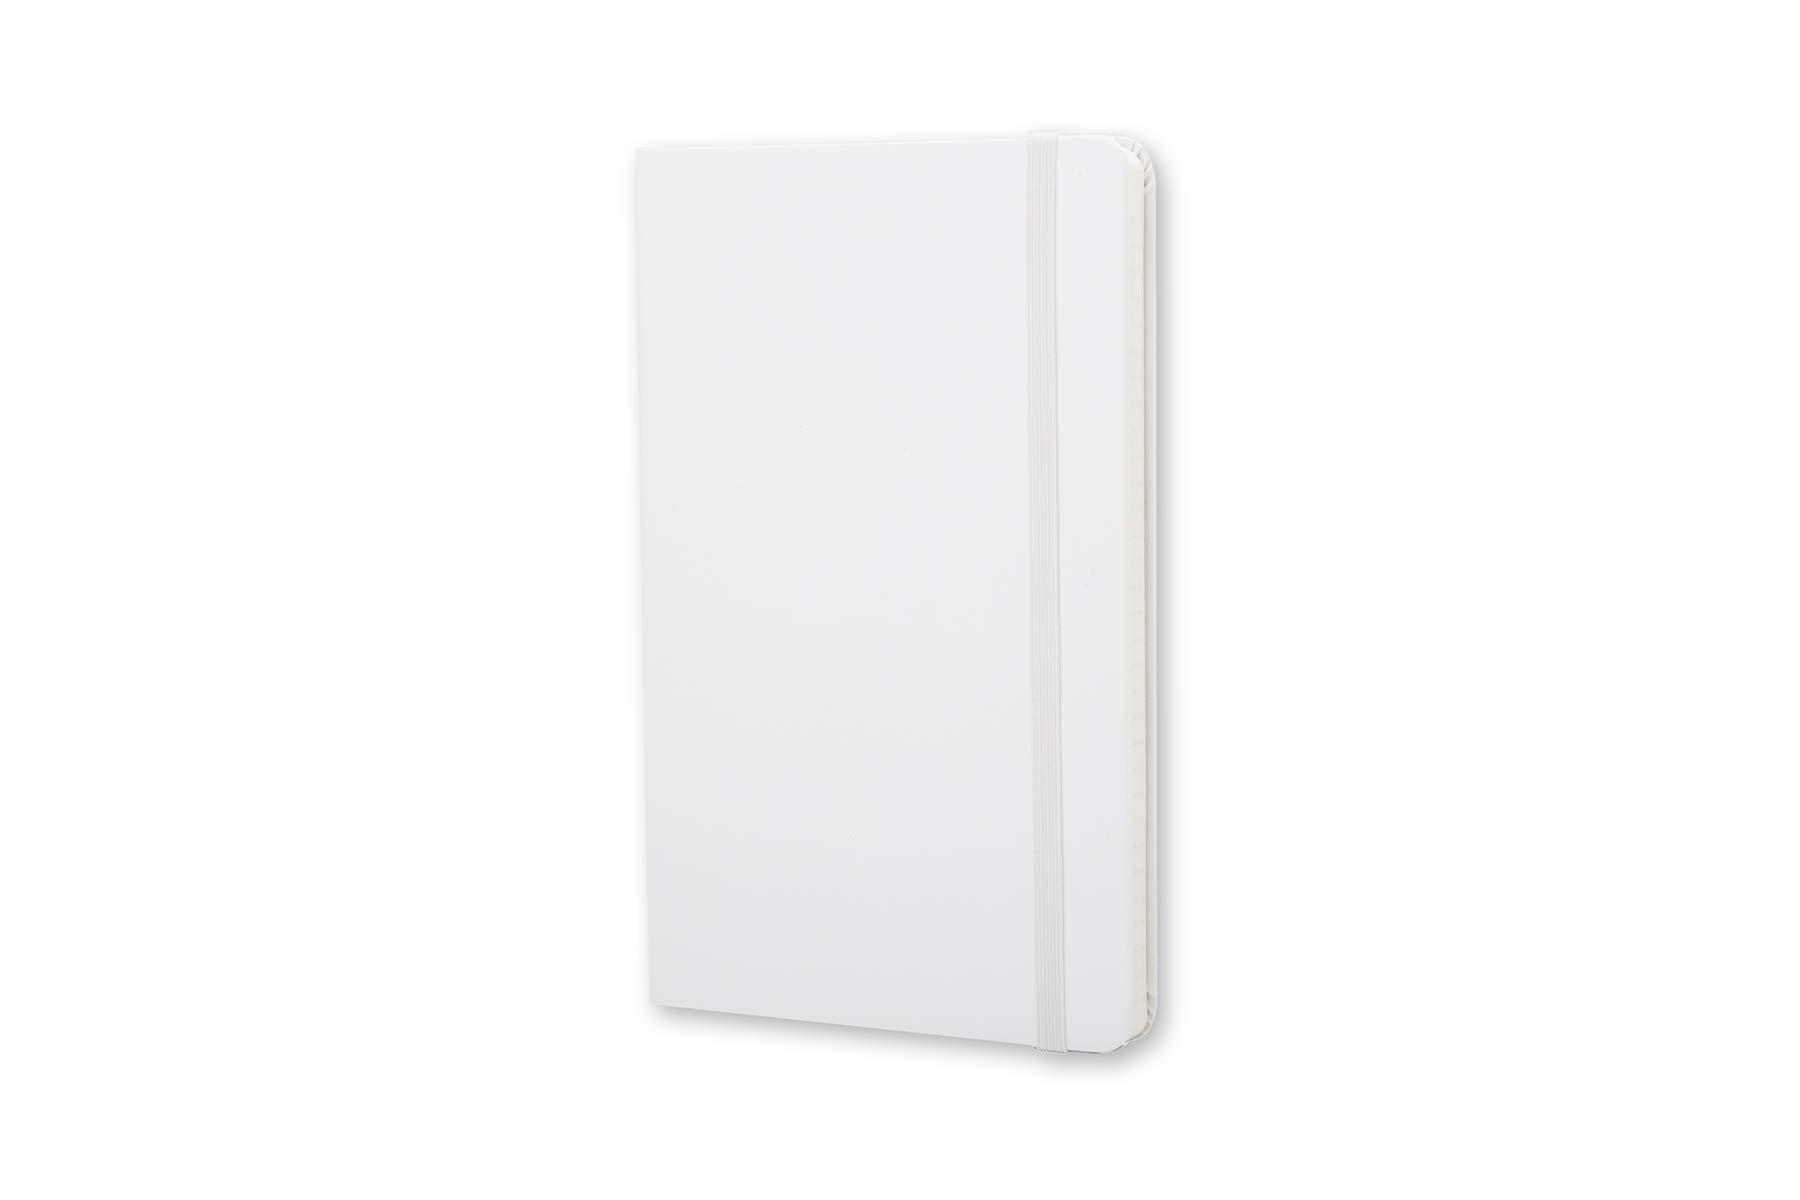 Moleskine Classic Notebook, Hard Cover, Large (5'' x 8.25'') Ruled/Lined, White by Moleskine (Image #2)